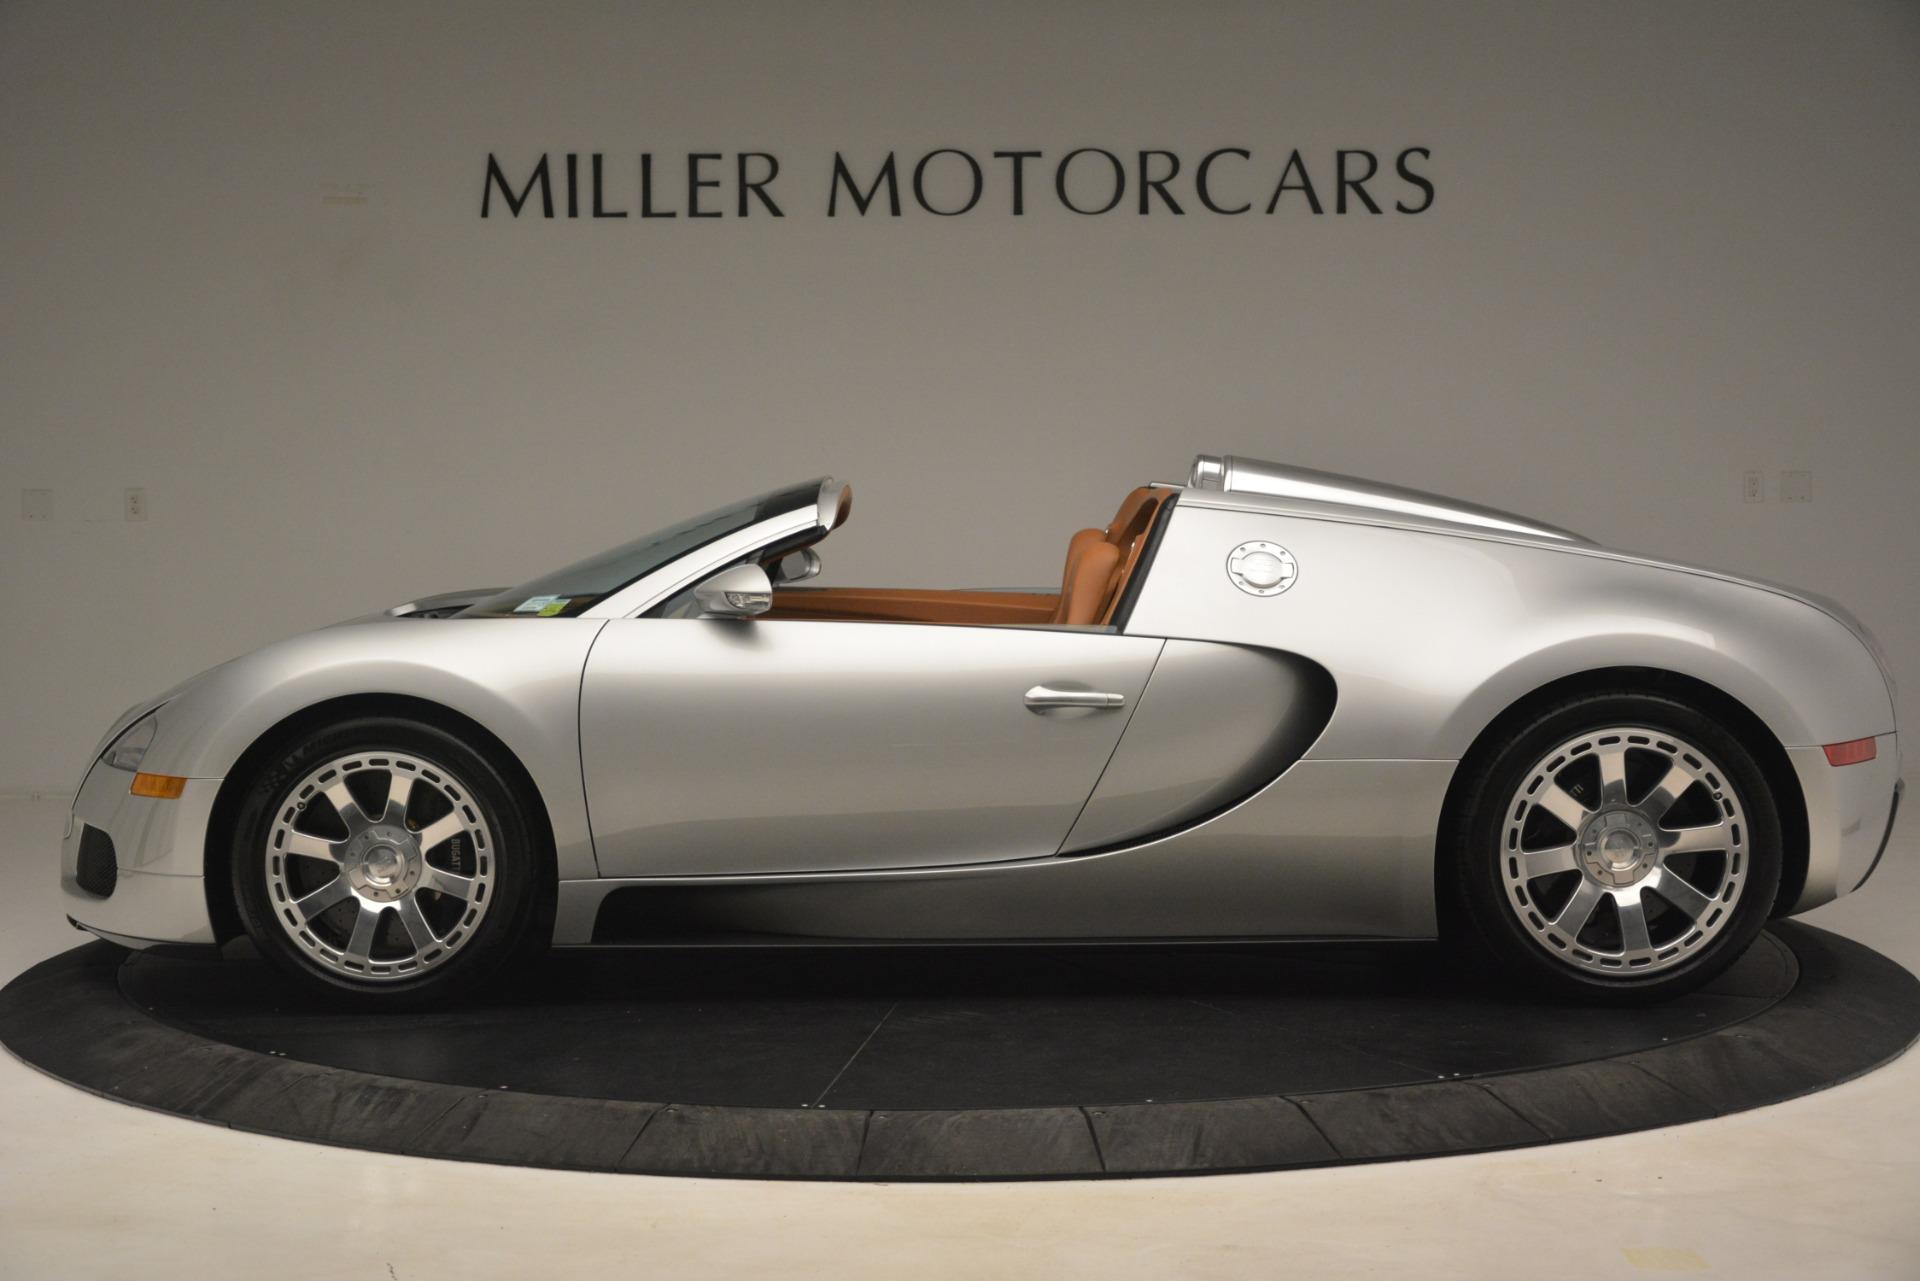 Used 2010 Bugatti Veyron 16.4 Grand Sport For Sale In Greenwich, CT 3159_p3